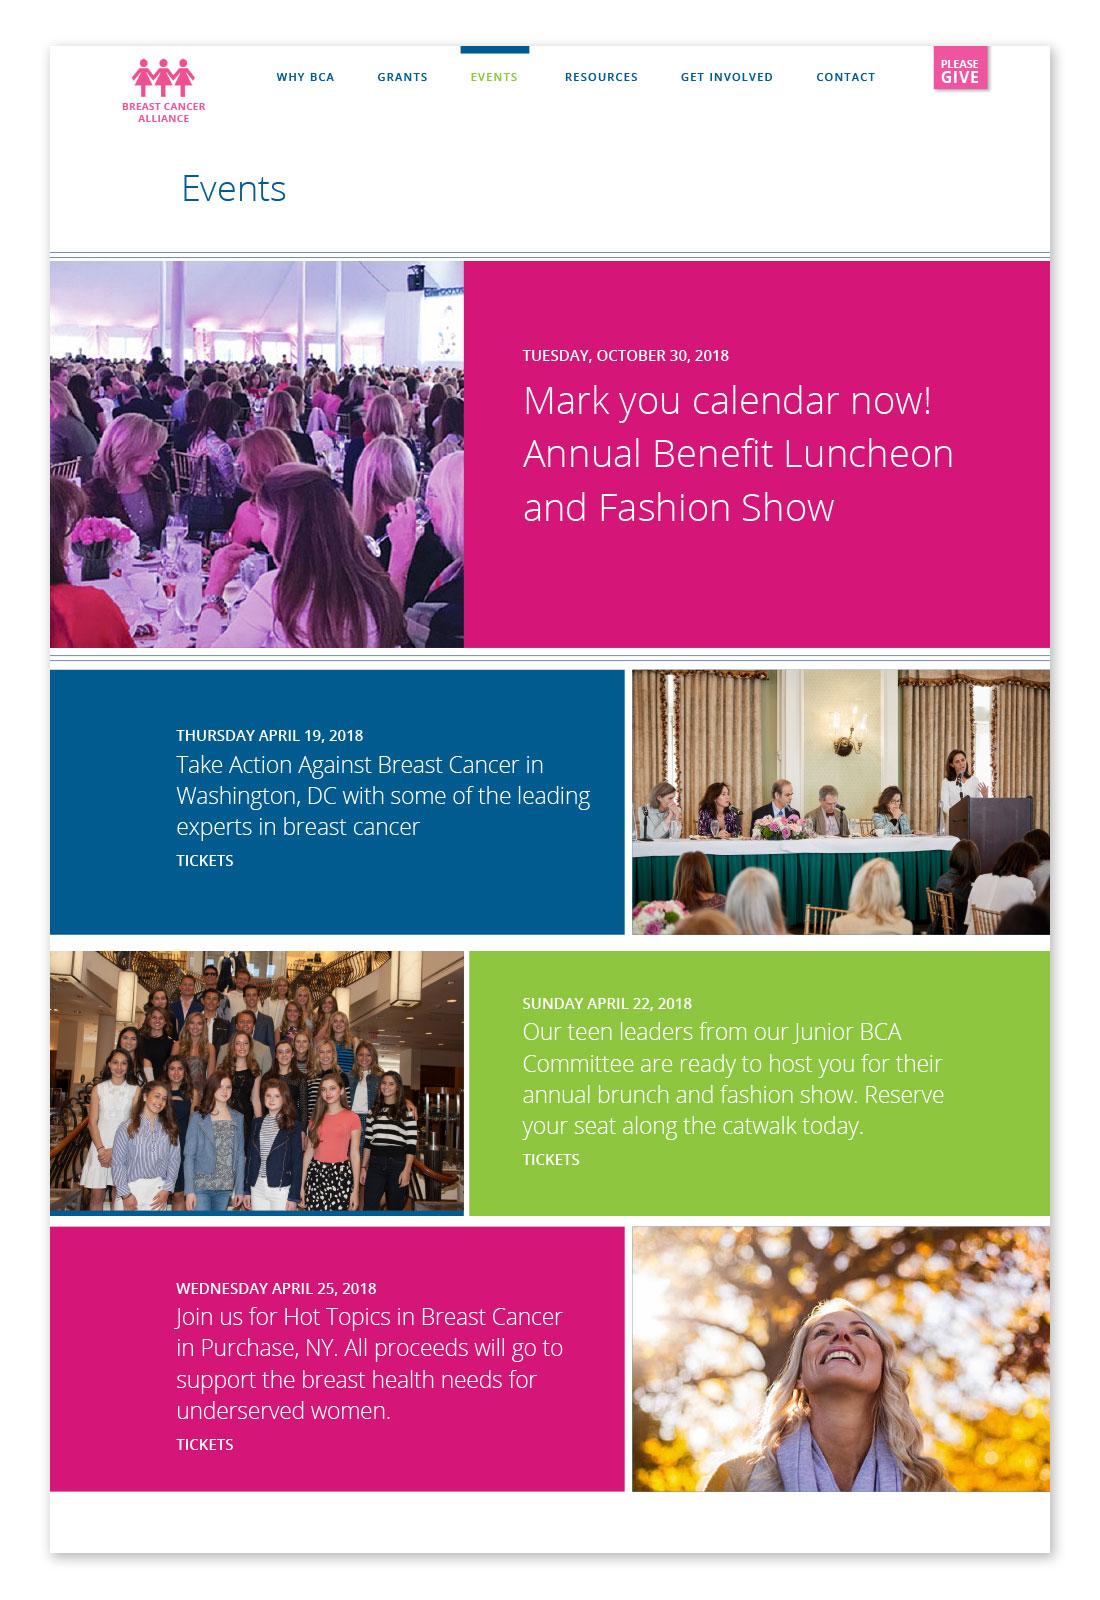 BCA.events.jpg